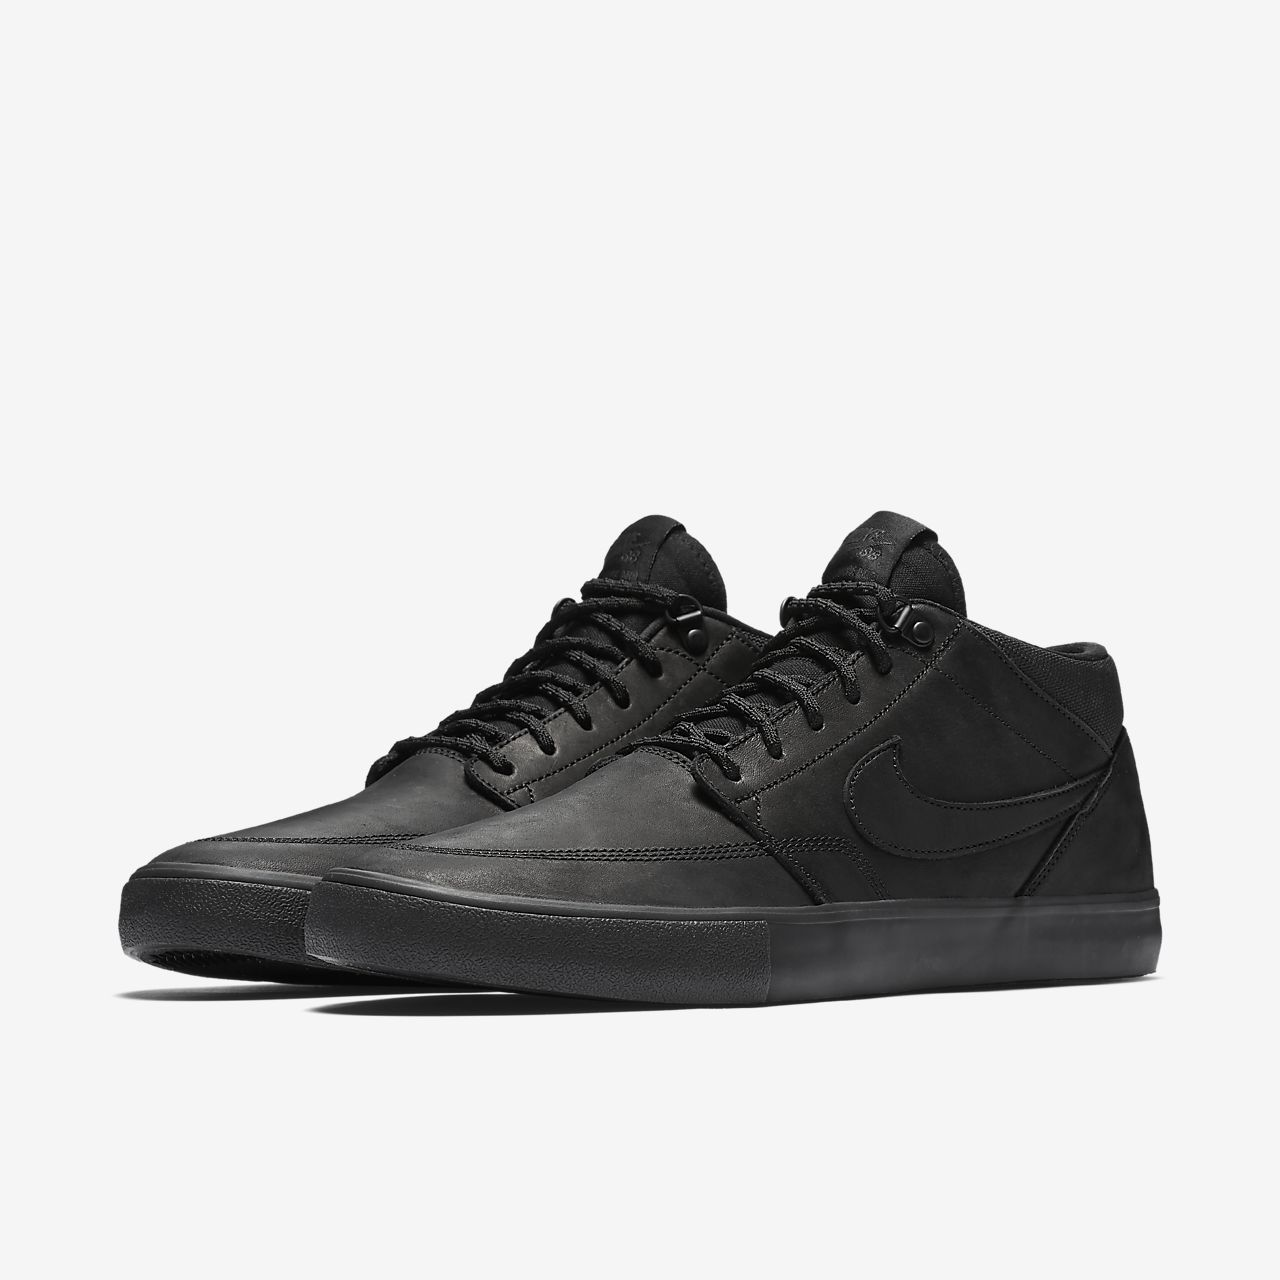 low priced e45b3 17ce2 Chaussure de skateboard Nike SB Solarsoft Portmore II Mid Premium pour Homme